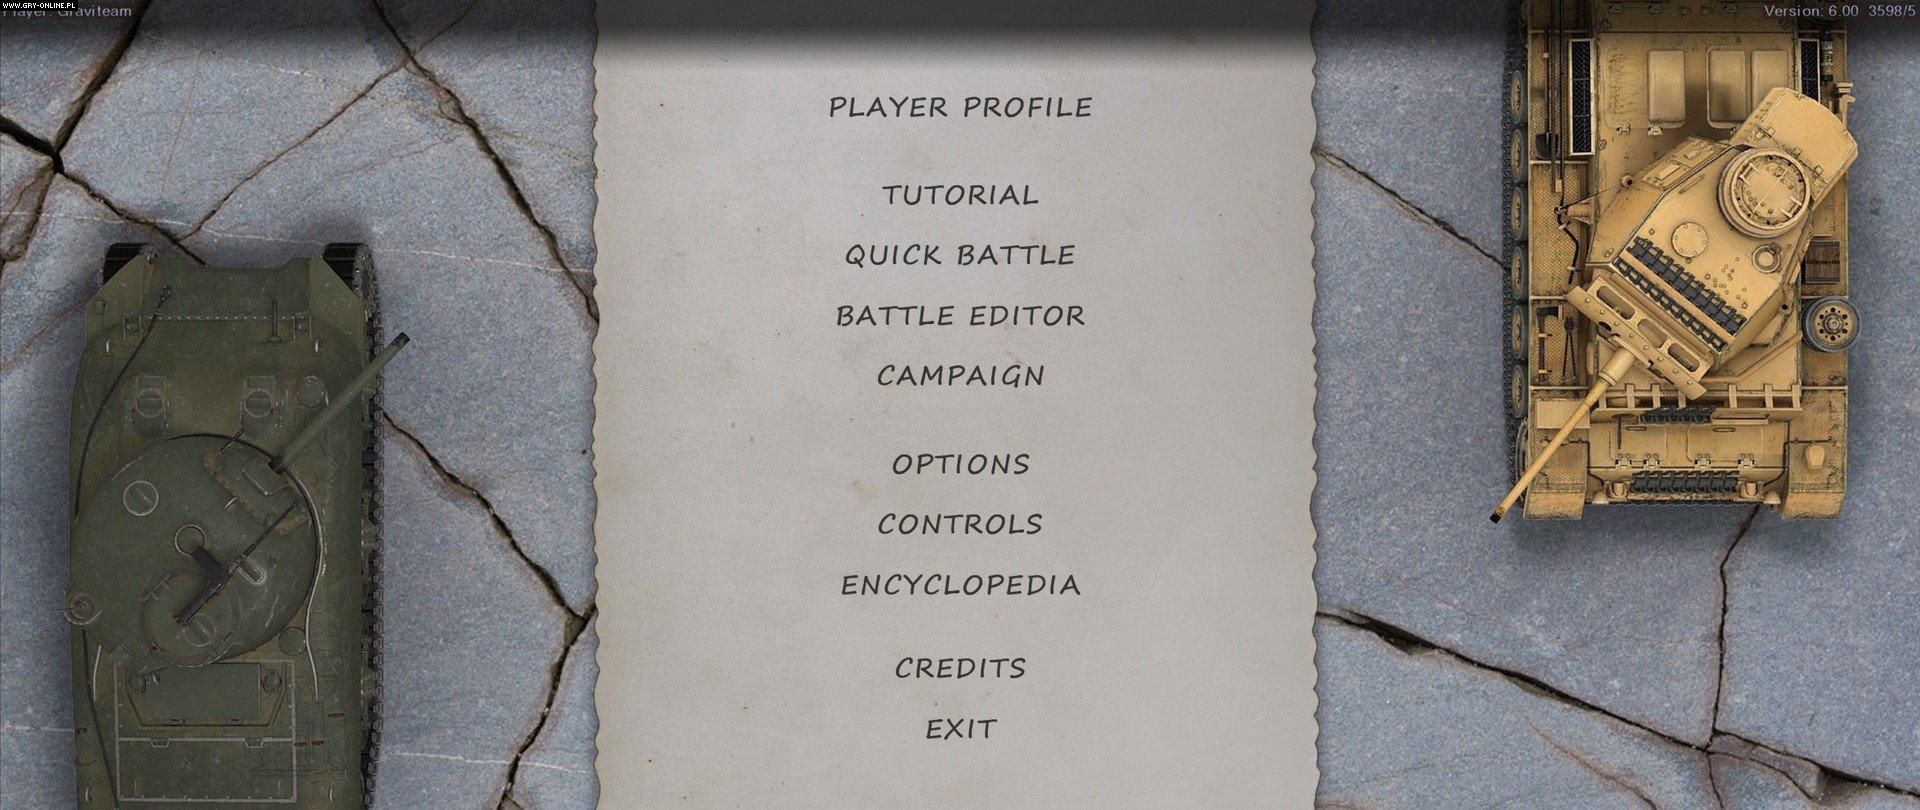 Tank Warfare: Tunisia 1943 PC Games Image 40/40, Graviteam, Strategy First